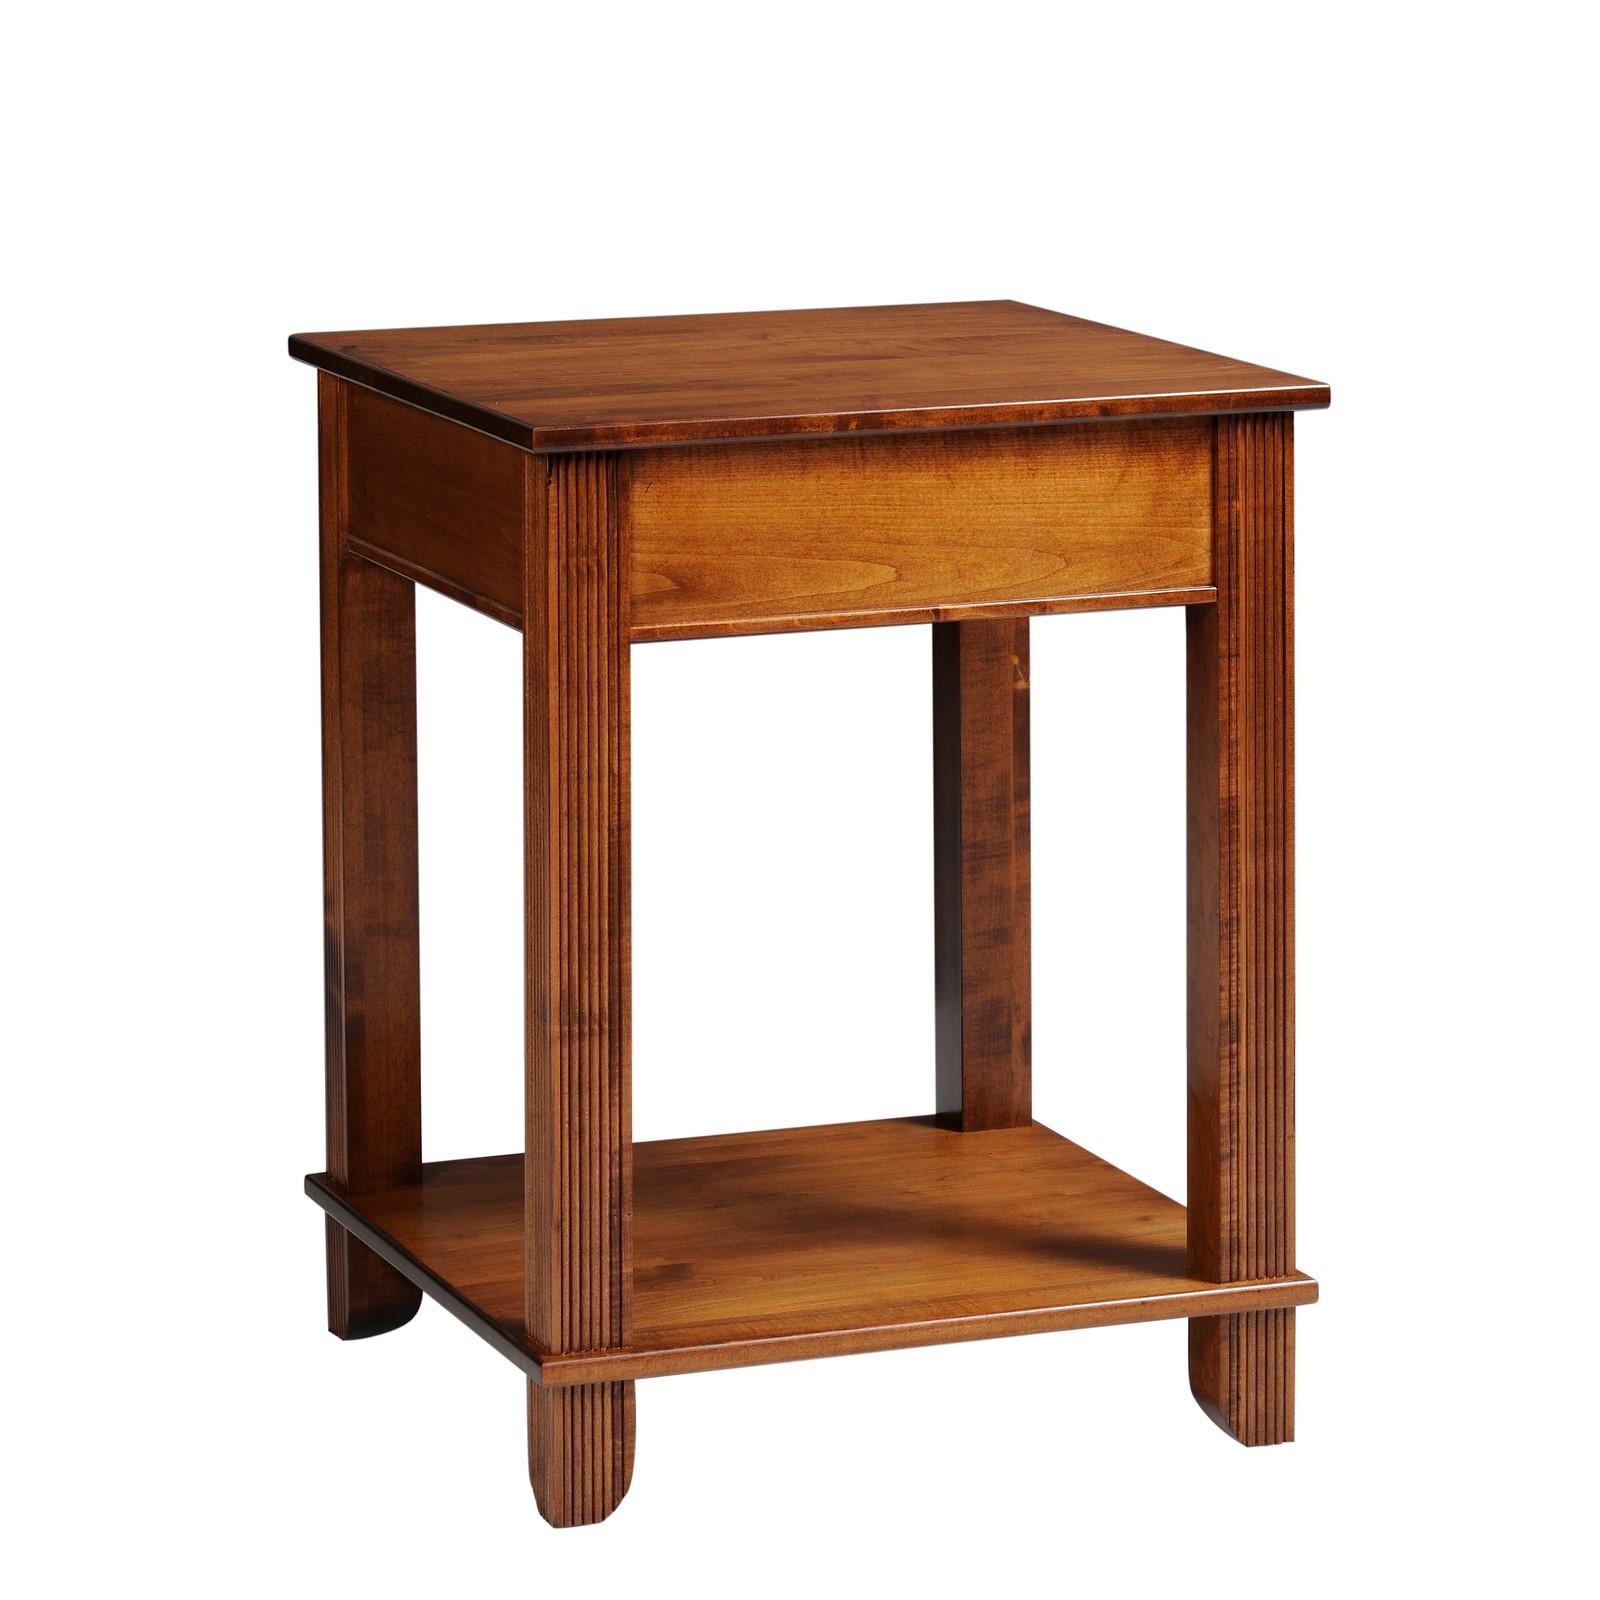 Y & T Woodcraft Modular Corner Table - Stewart Roth Furniture